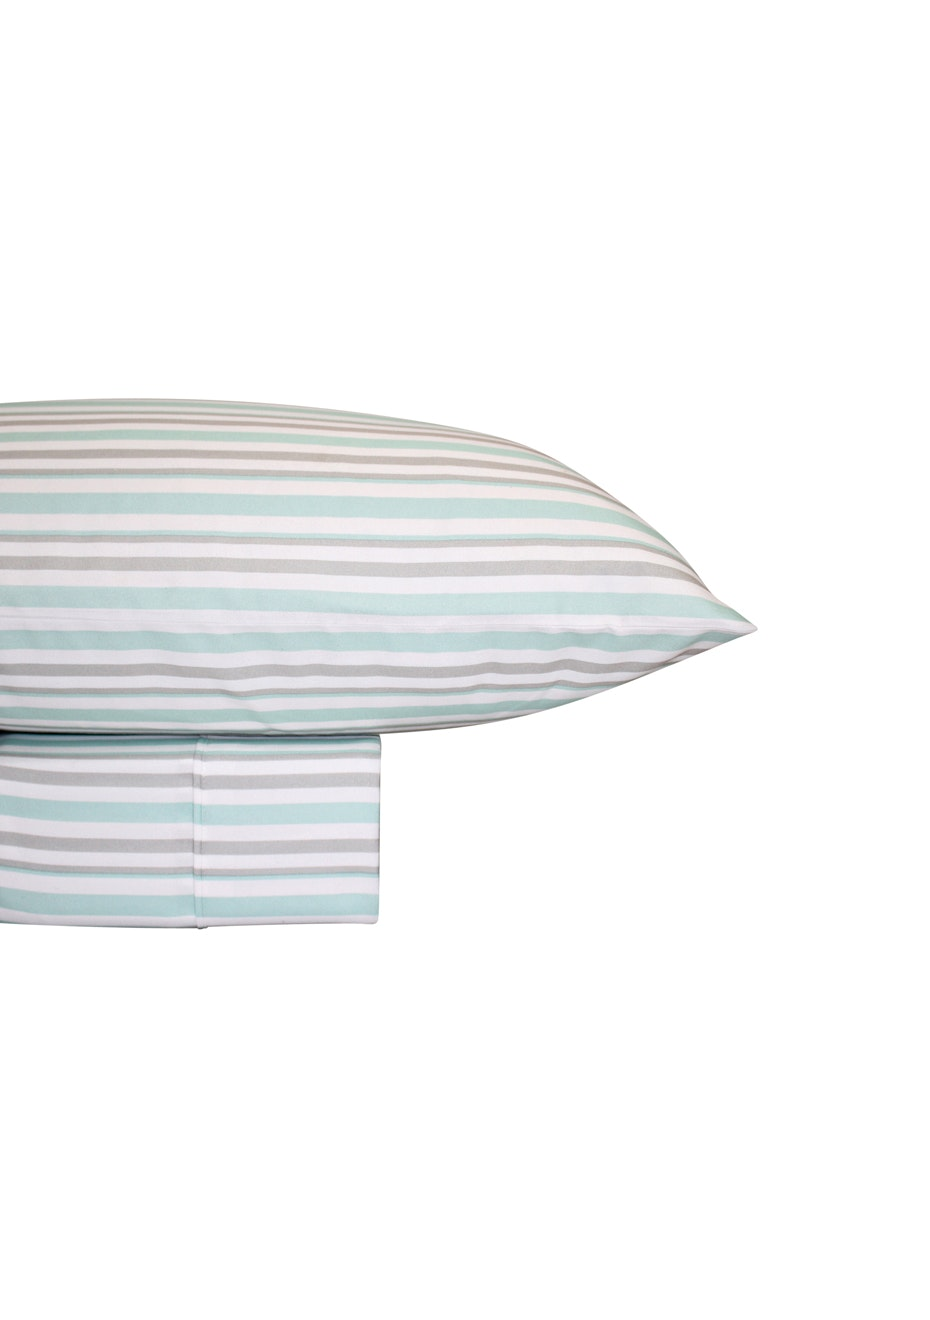 Thermal Flannel Sheet Sets - Stripe Design - Ice/Glacier - Queen Bed